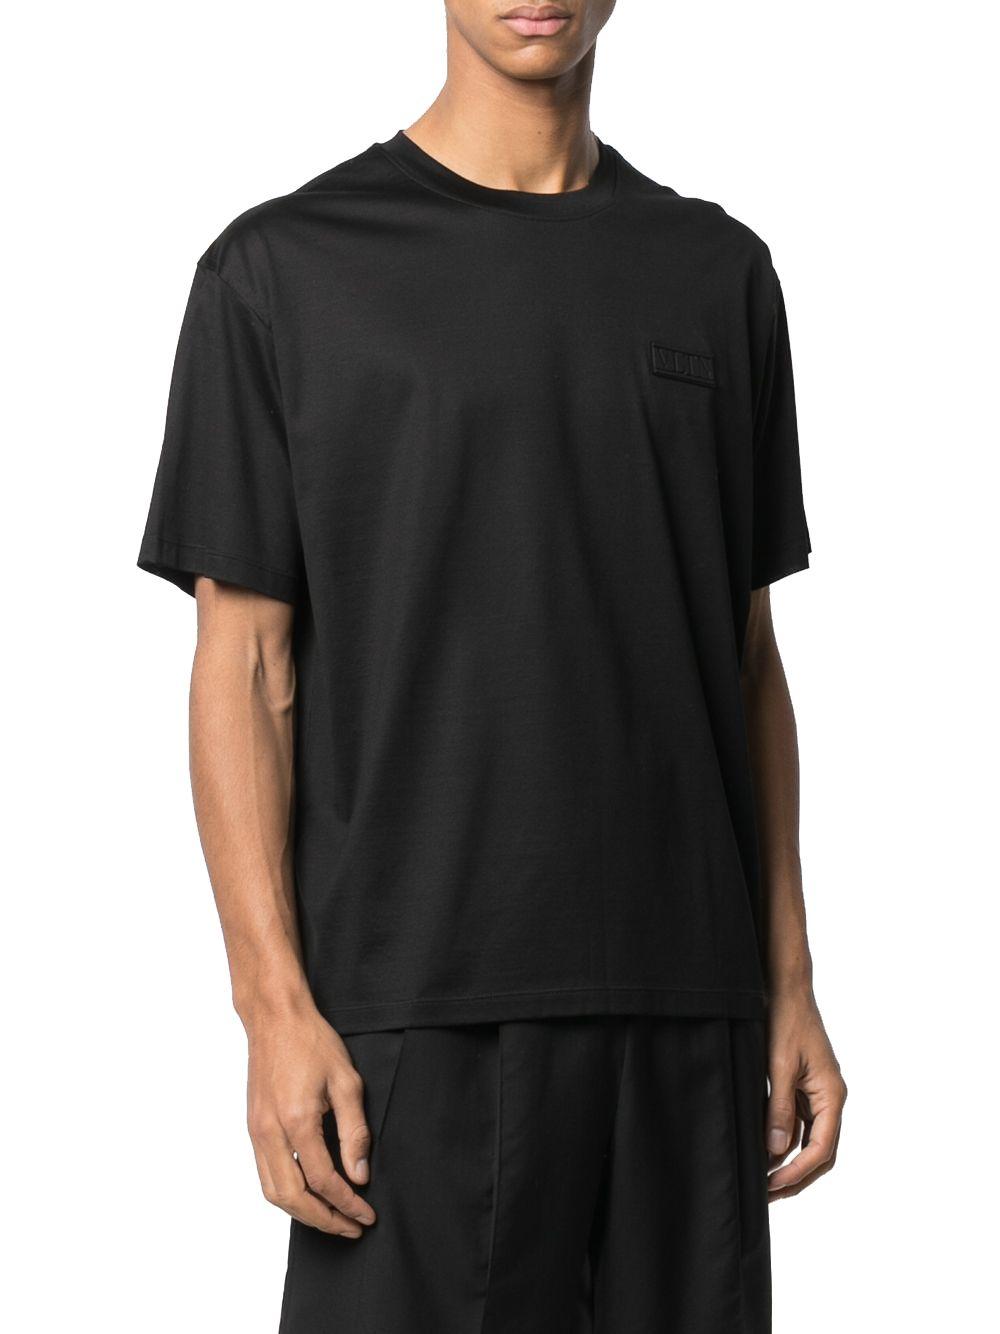 VALENTINO Cottons VALENTINO MEN'S BLACK COTTON T-SHIRT